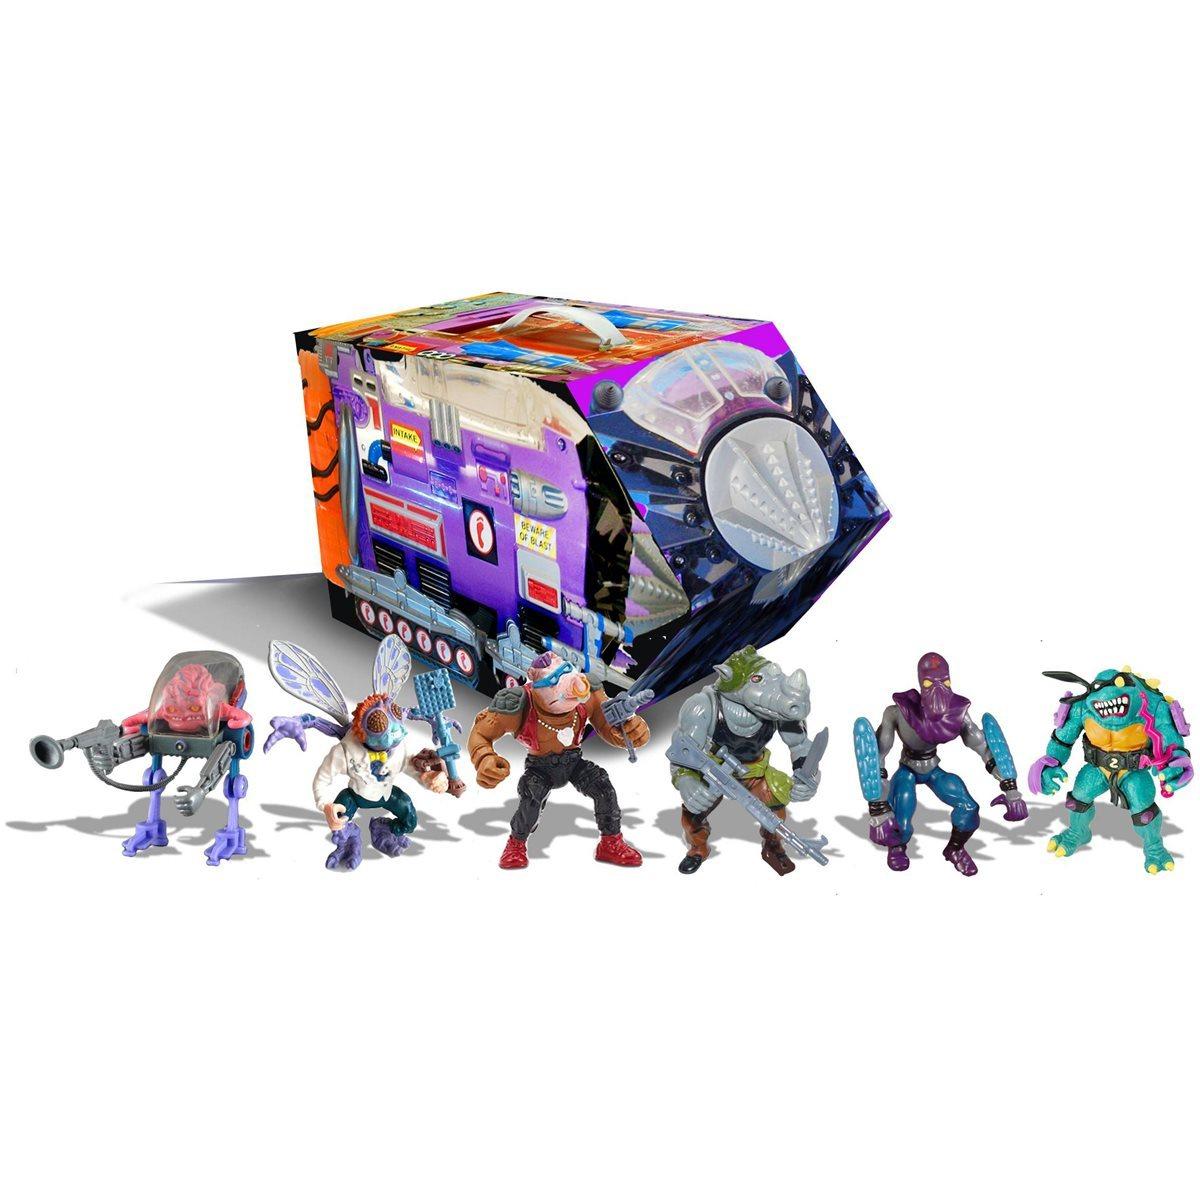 Teenage Mutant Ninja Turtles: Retro Villains Mutant Module Rotocast Action Figure 6-Pack - Previews Exclusive by Playmates